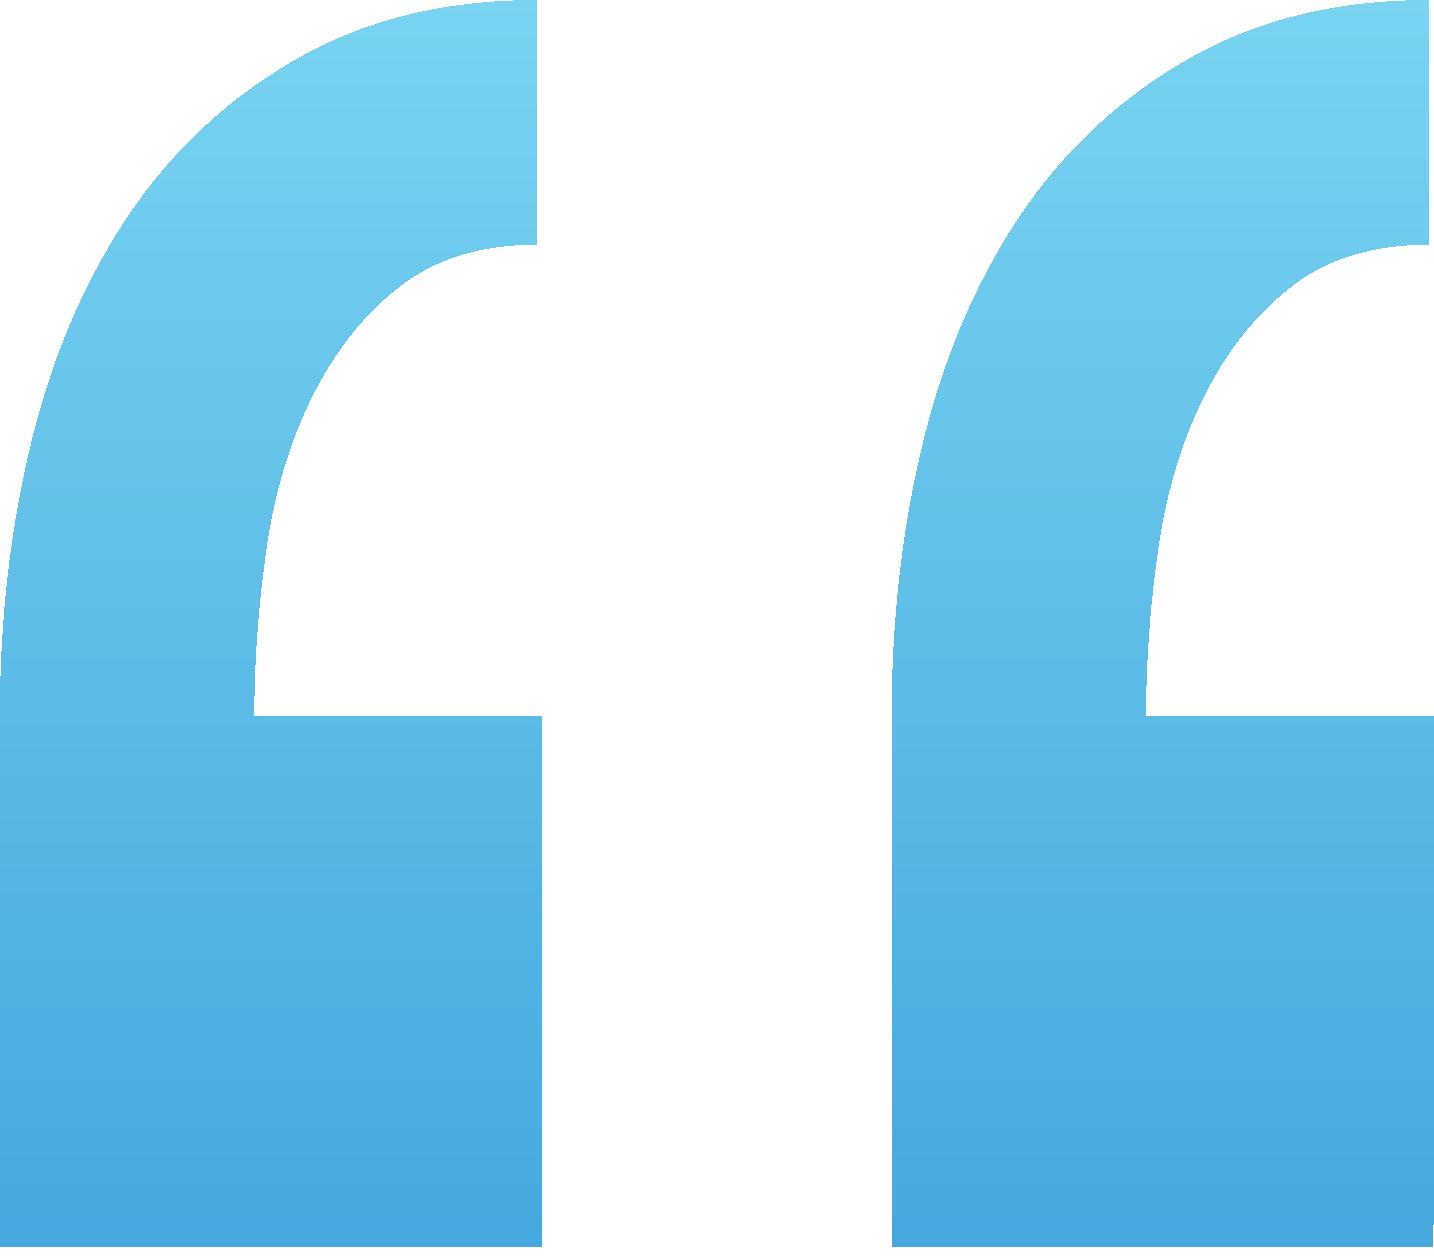 quotation mark illustration